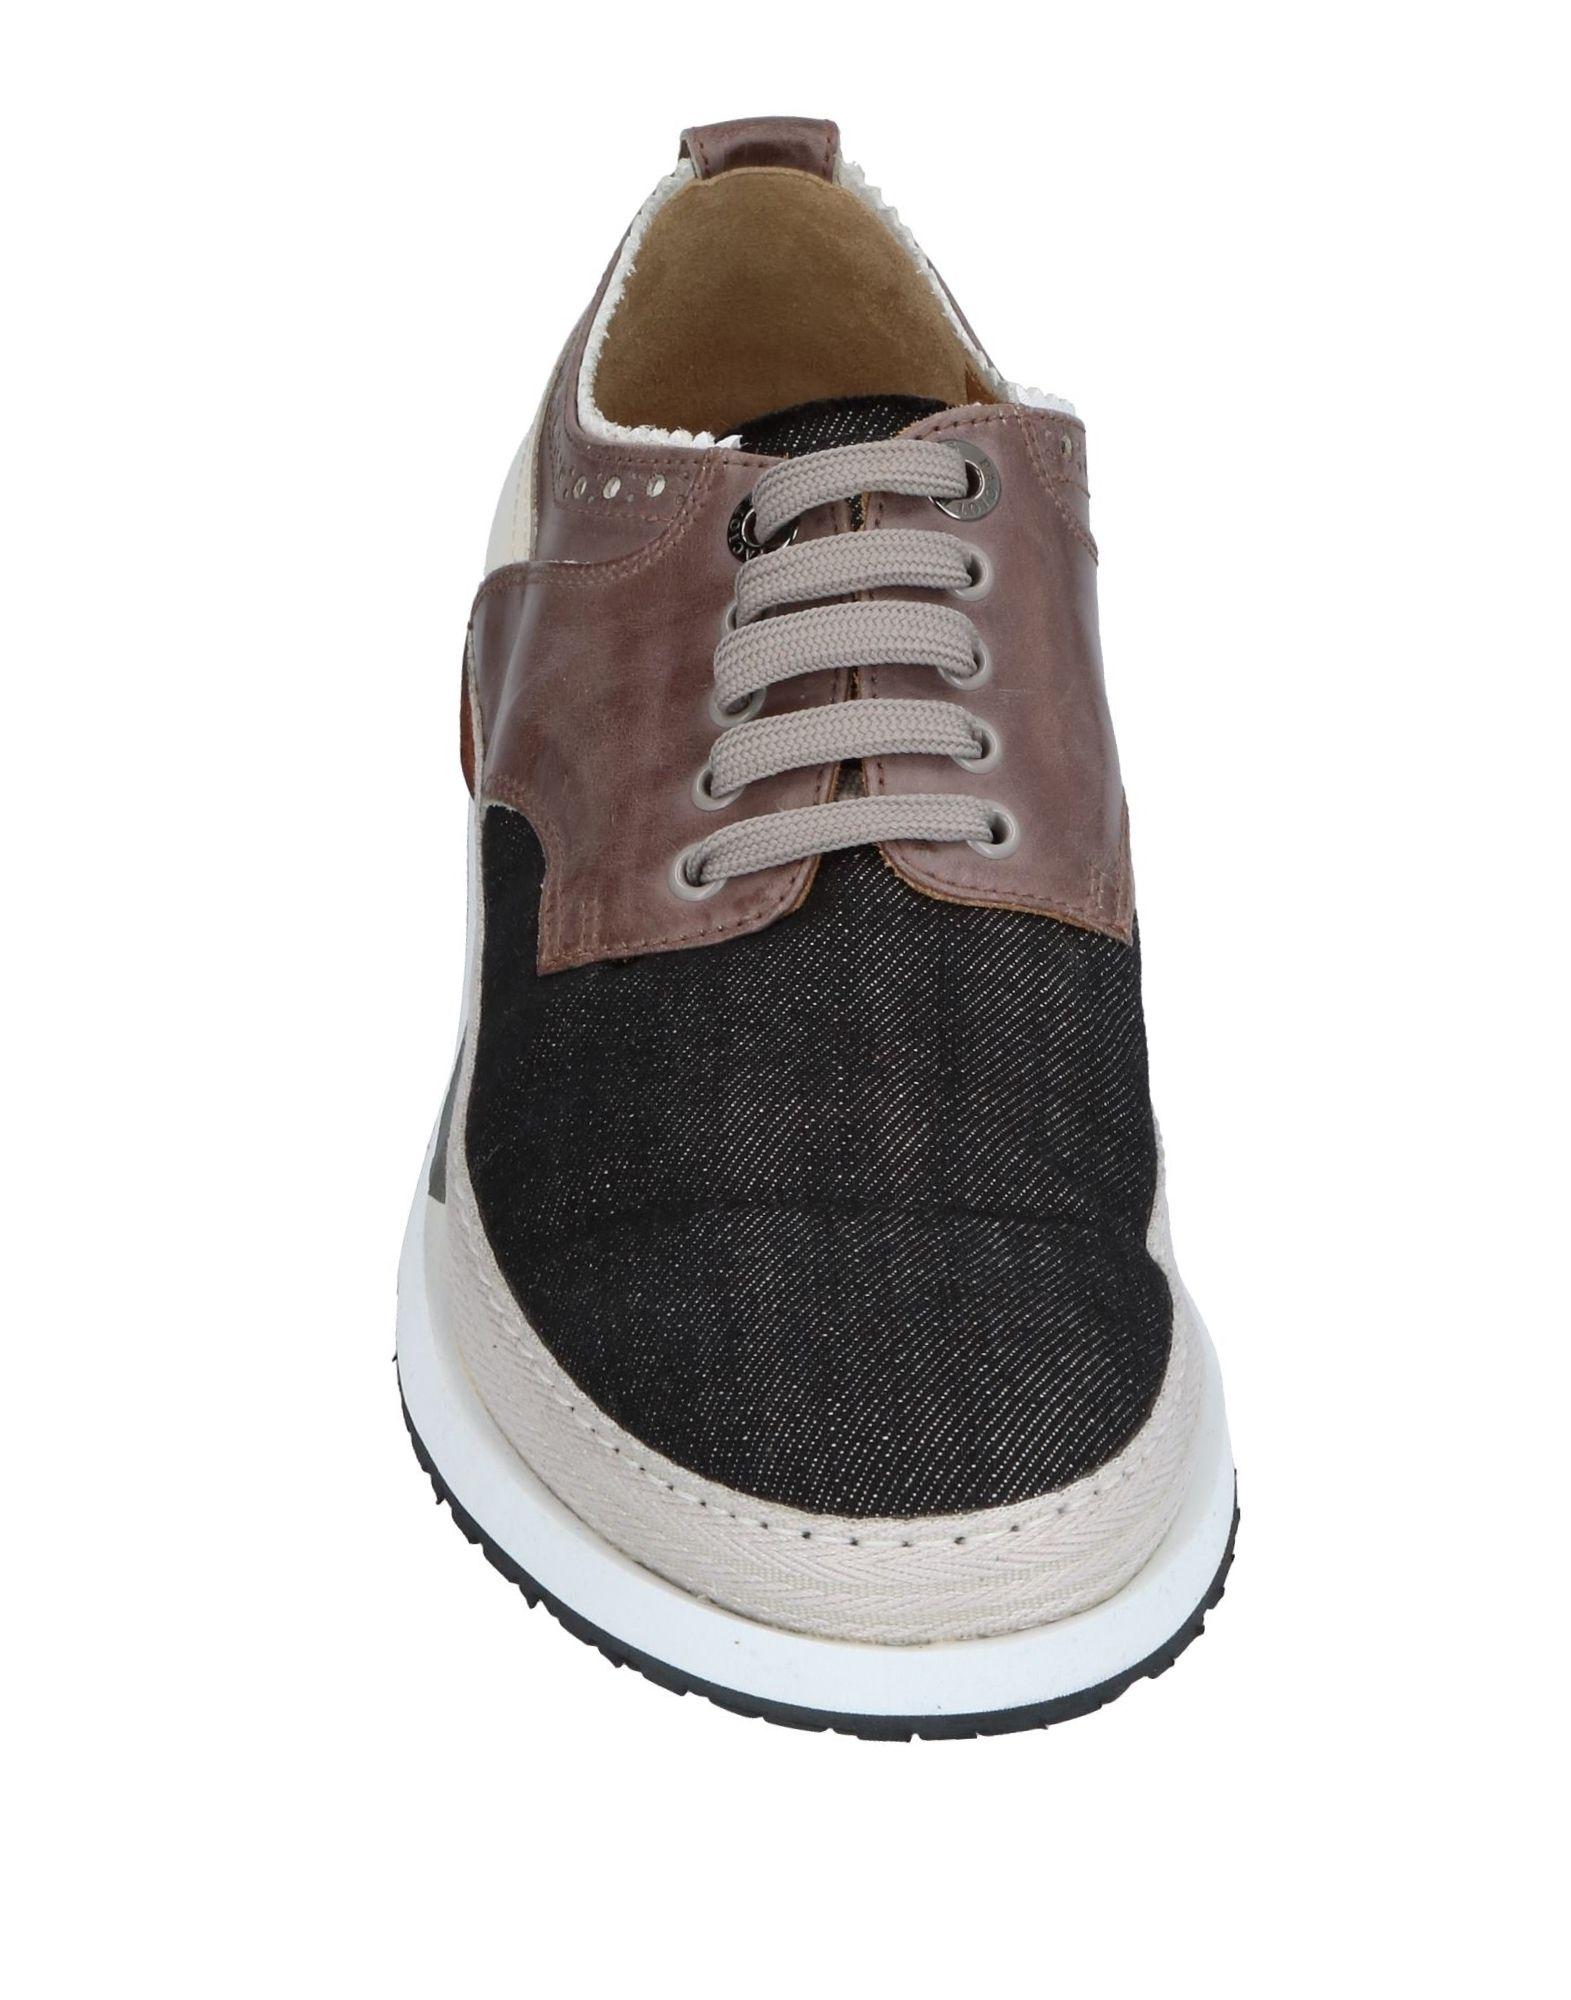 Cesare Paciotti 4Us Sneakers Sneakers 4Us Herren  11396320MS Neue Schuhe 2f3c6e